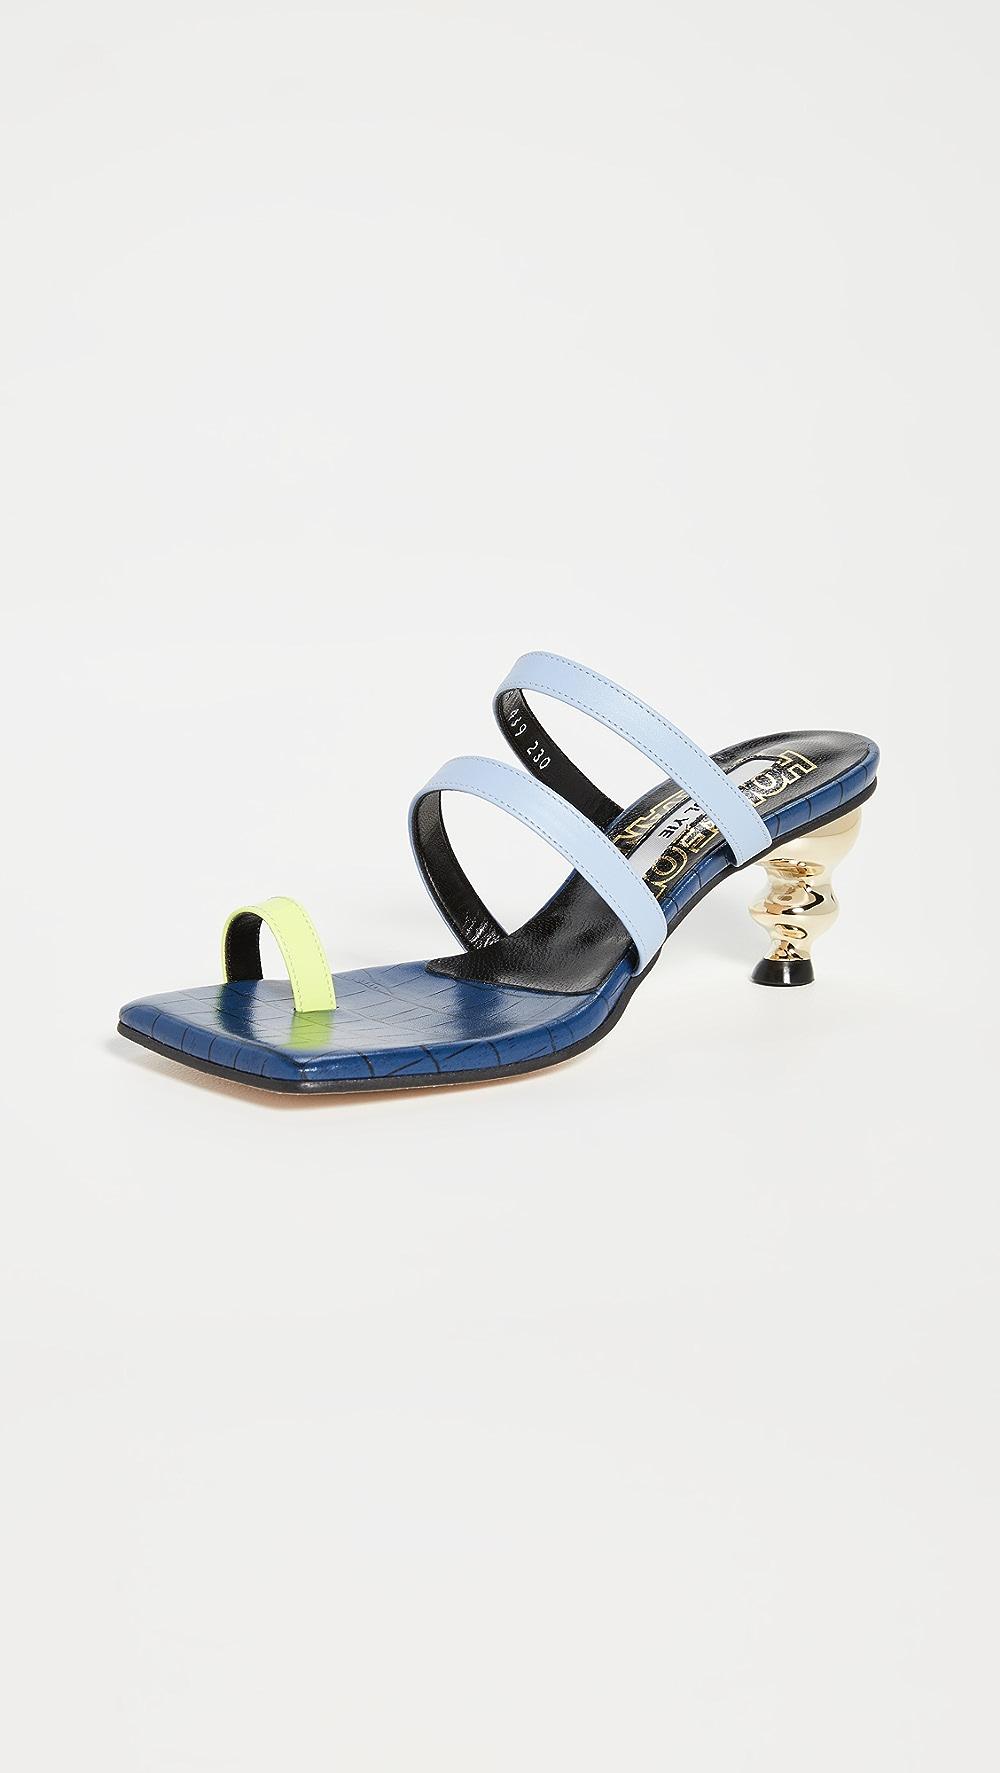 Energetic House Of Holland - Sunrise Sandals 100% Original